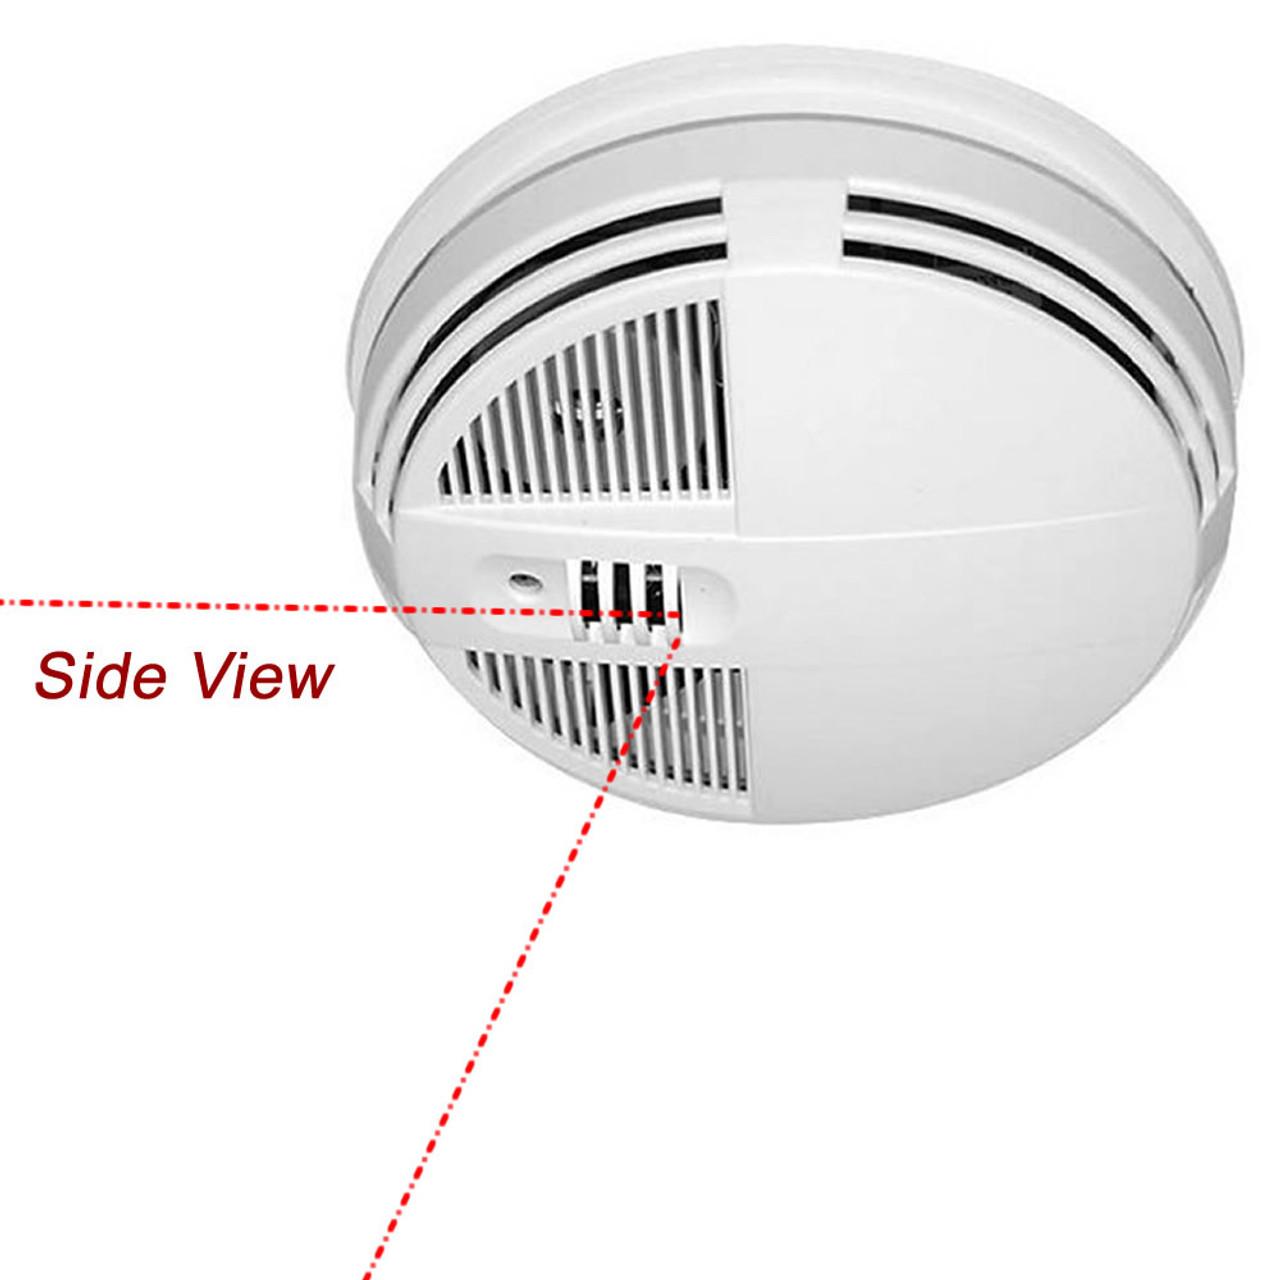 Smoke Detector Night Vision Hidden Camera W Wifi Remote View 90